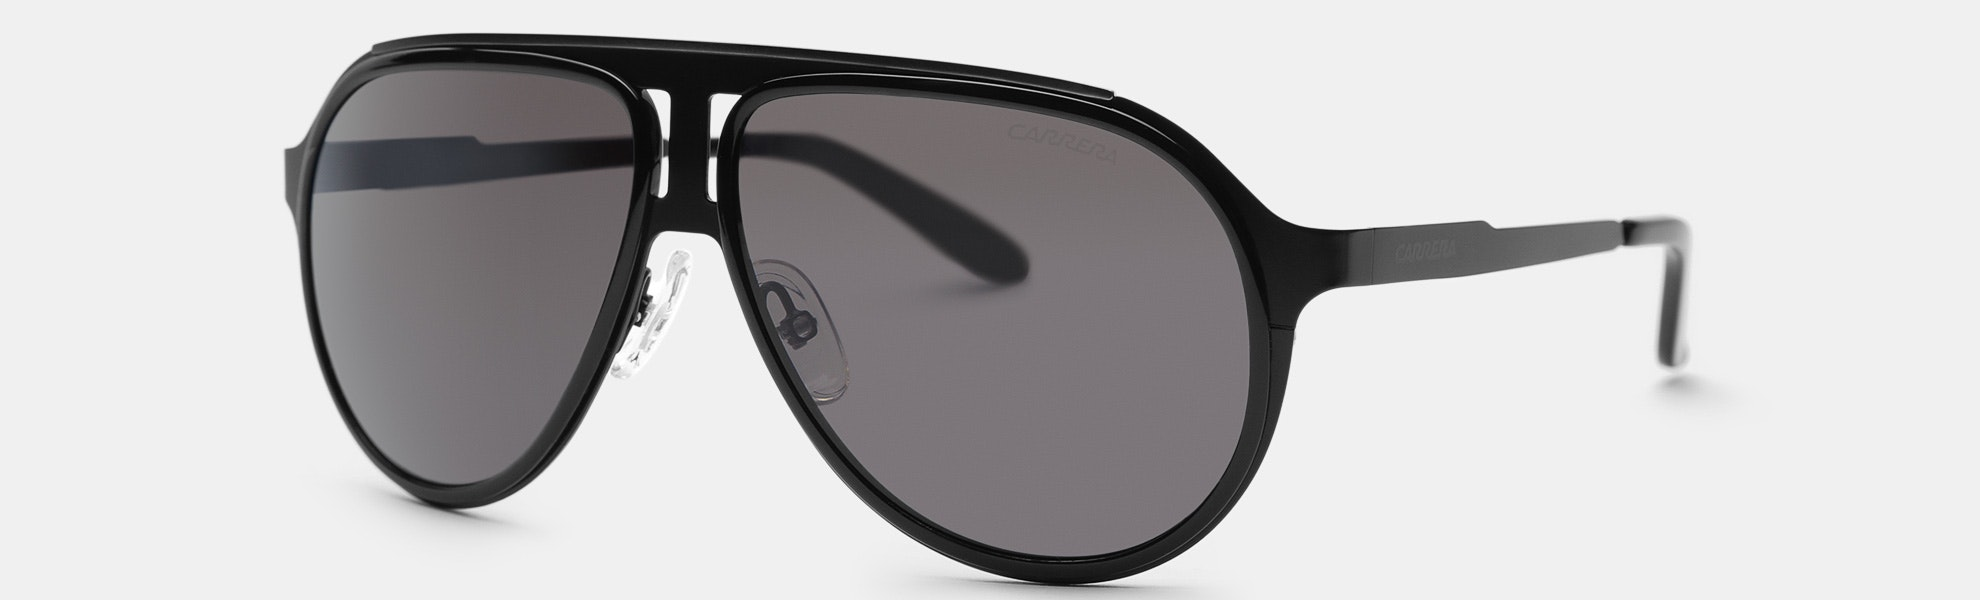 Carrera 100S Sunglasses